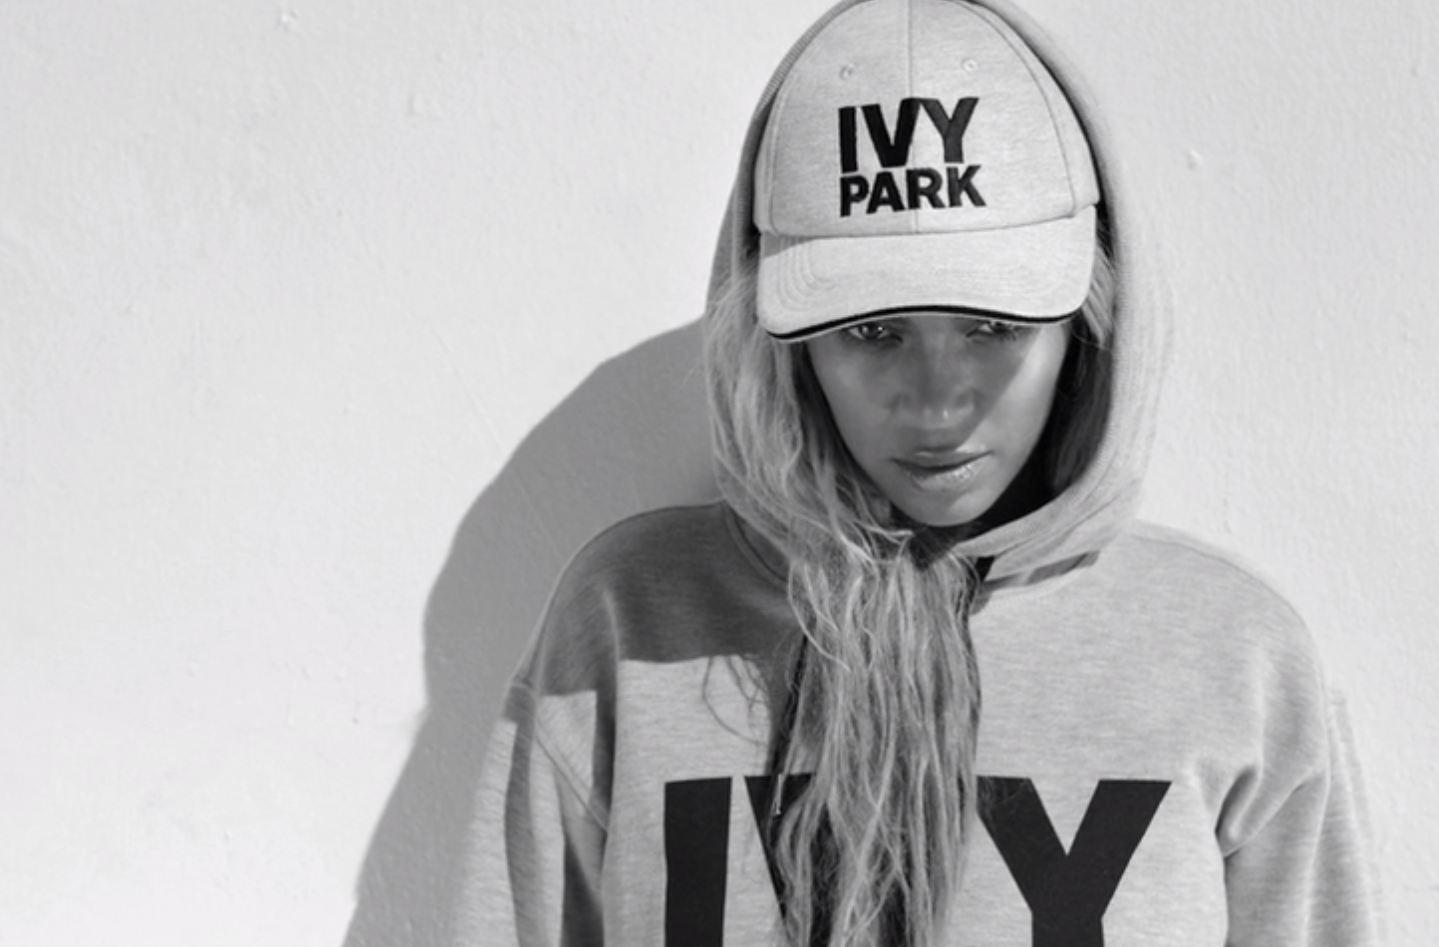 (Picture: Ivy Park)